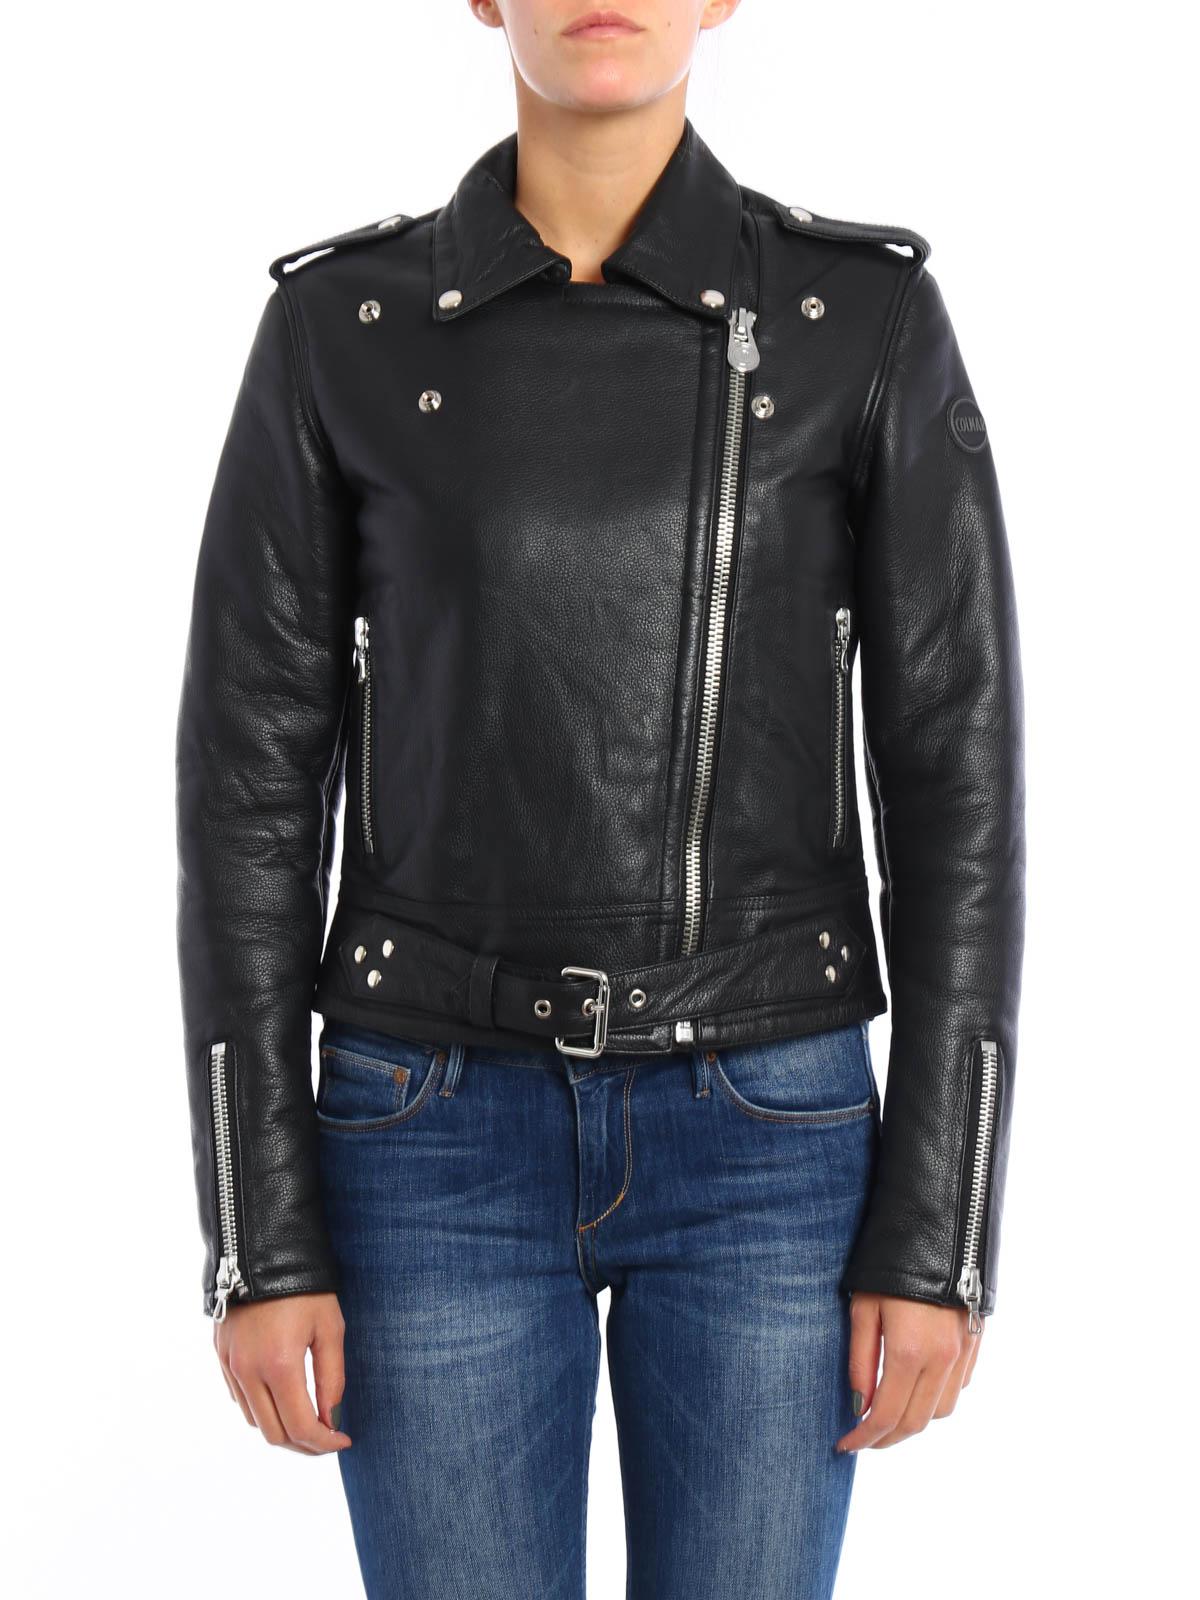 Colmar Originals Giacca biker in pelle giacche in pelle